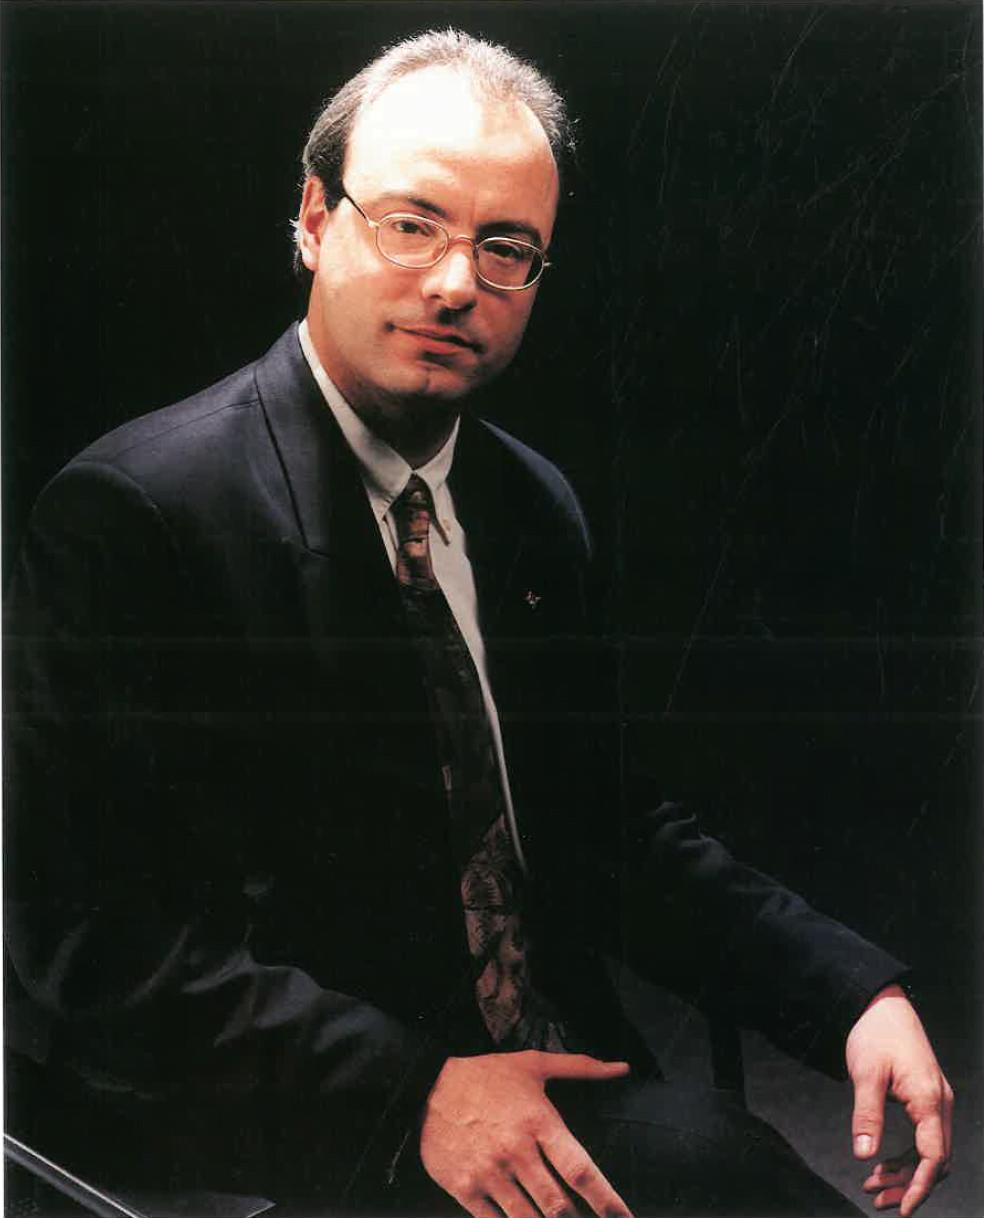 Xavier M. Sanllehí Brunet